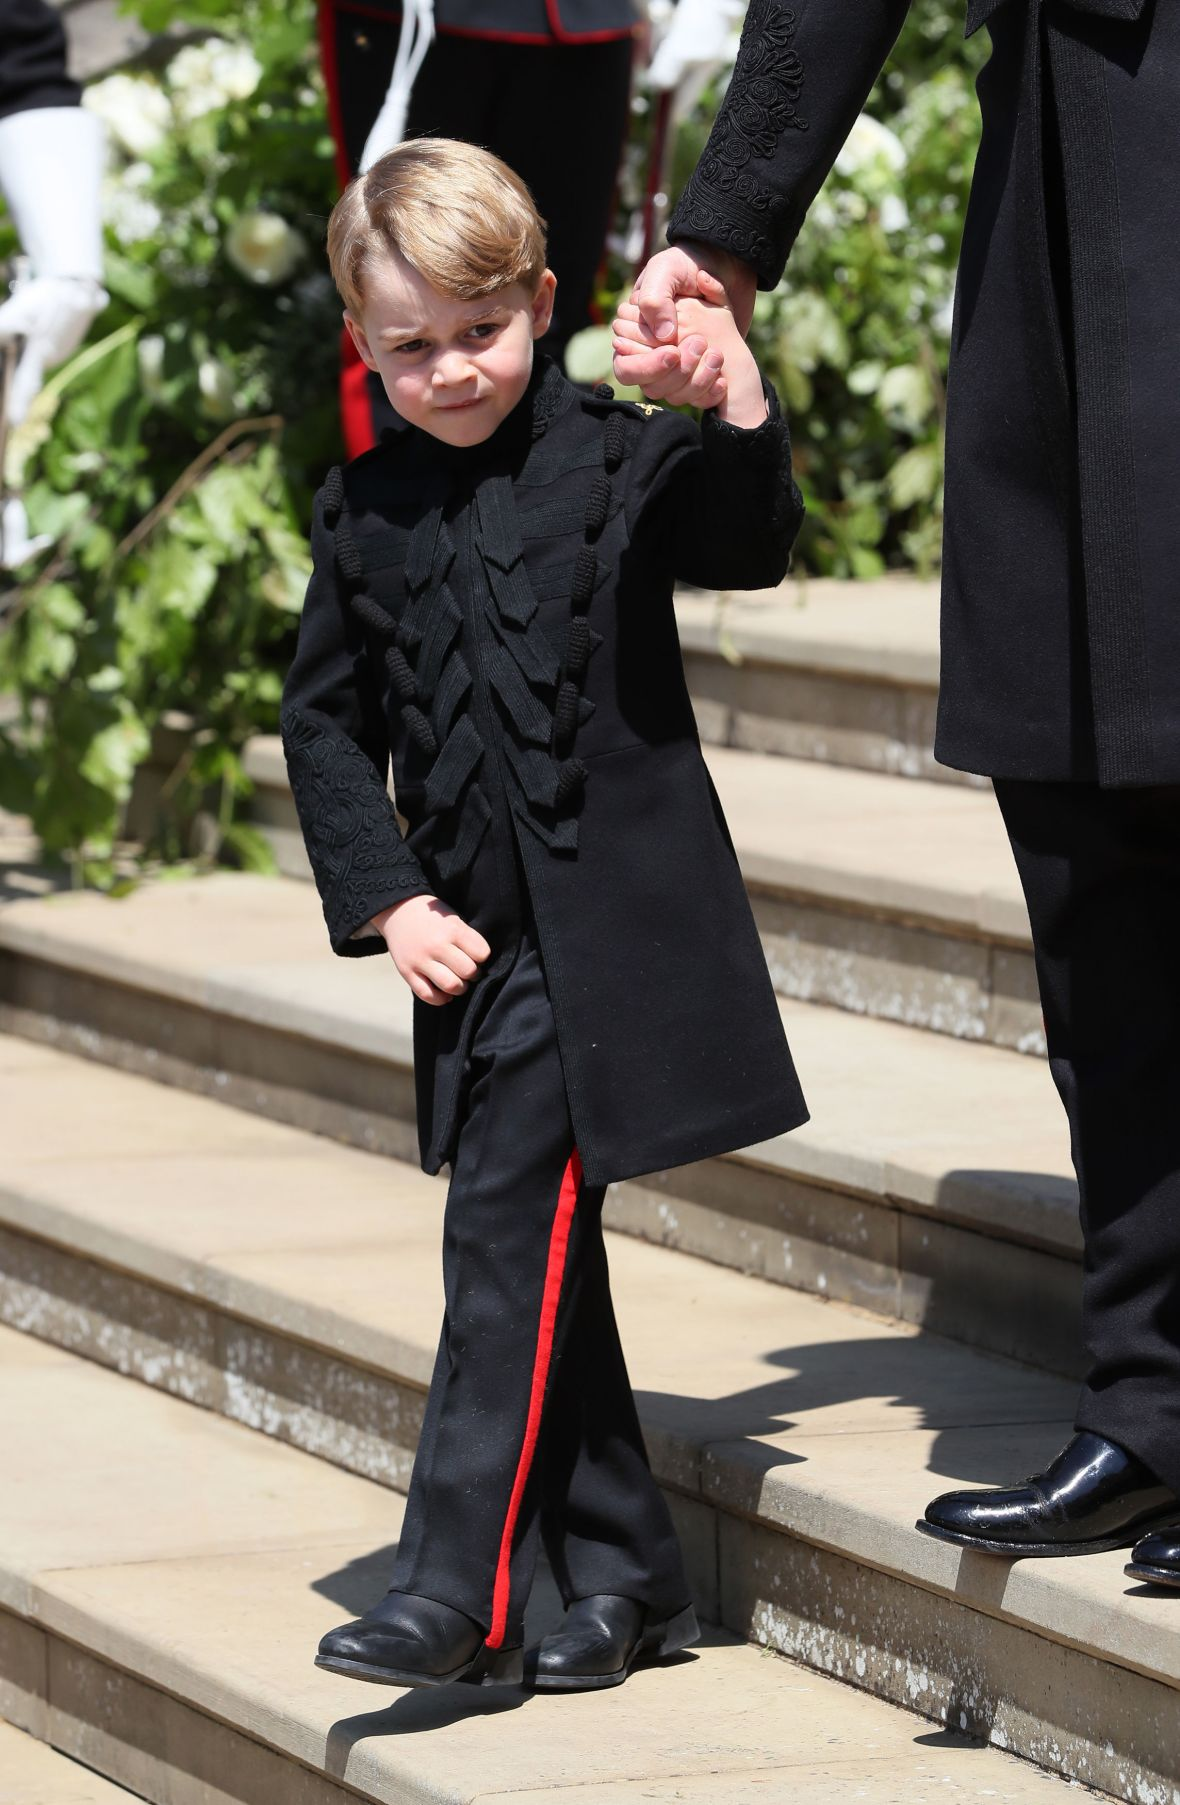 prince george royal wedding getty images